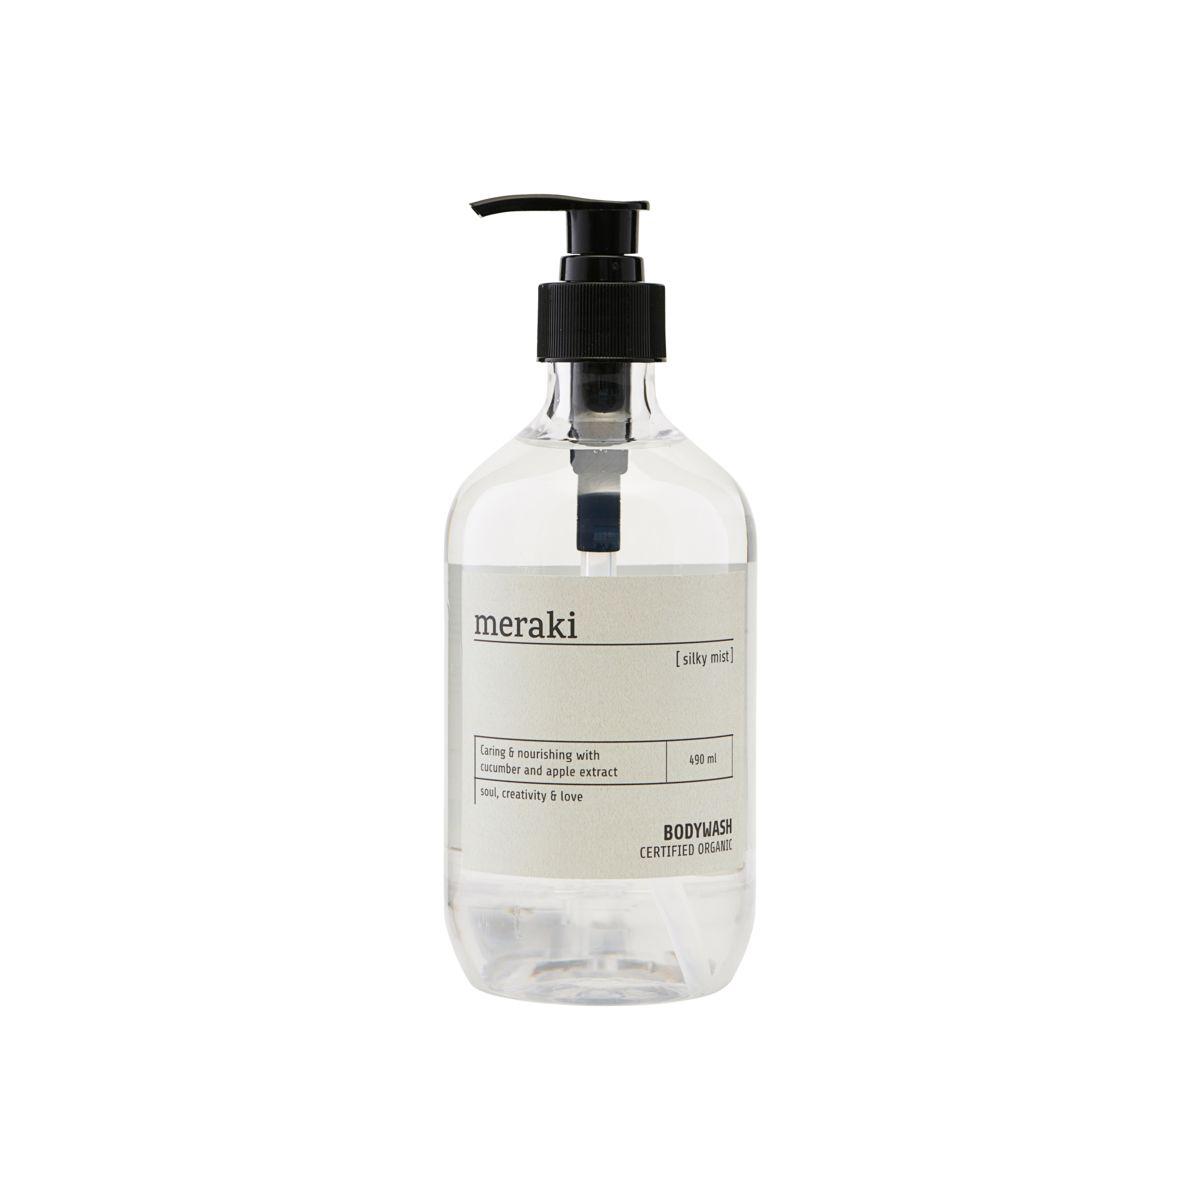 Meraki Silky Mist Body Wash, 490 ml